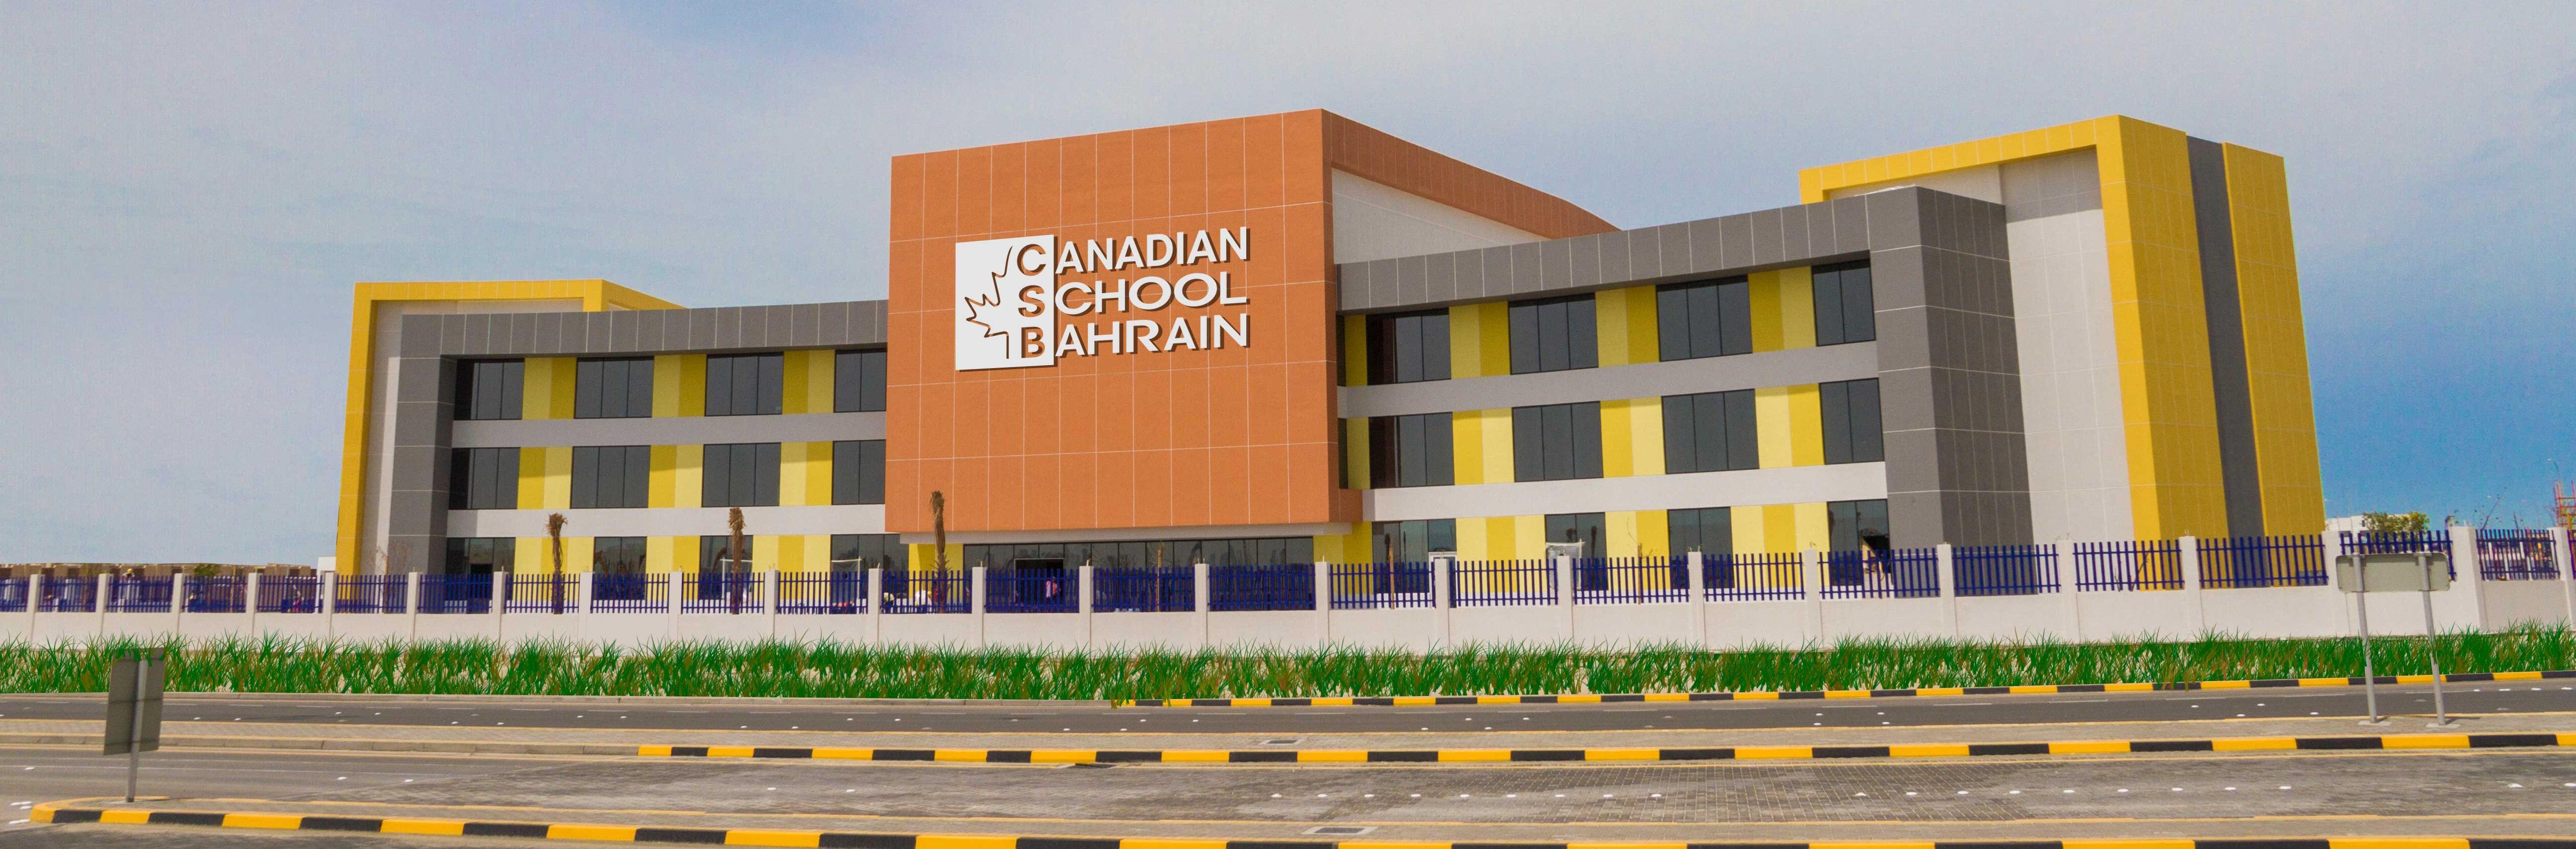 Canadian School Bahrain - New Schools in Bahrain